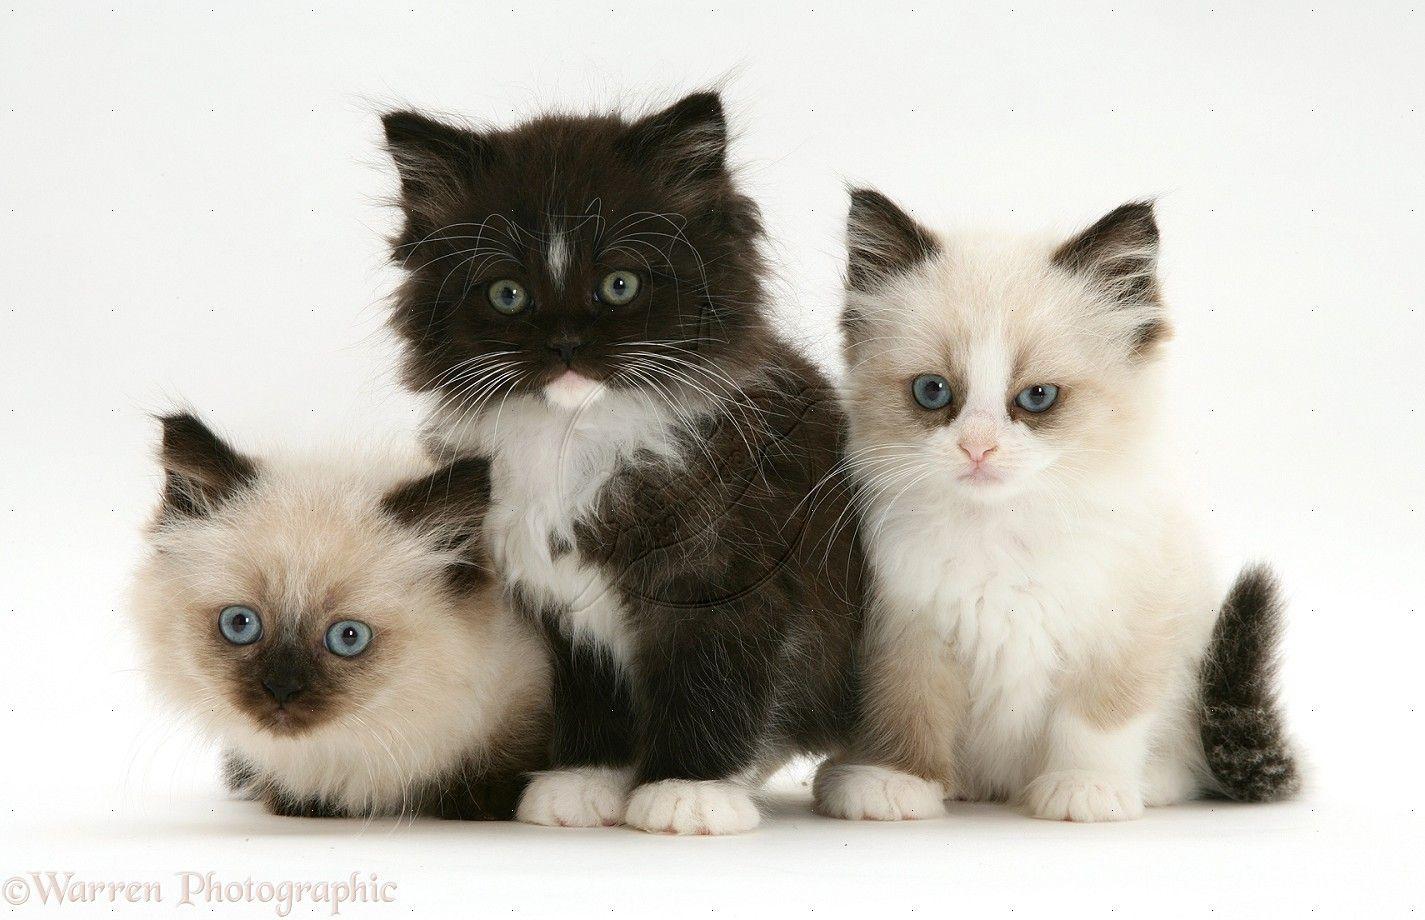 Three cute Persian kittens, just sitting, looking cute